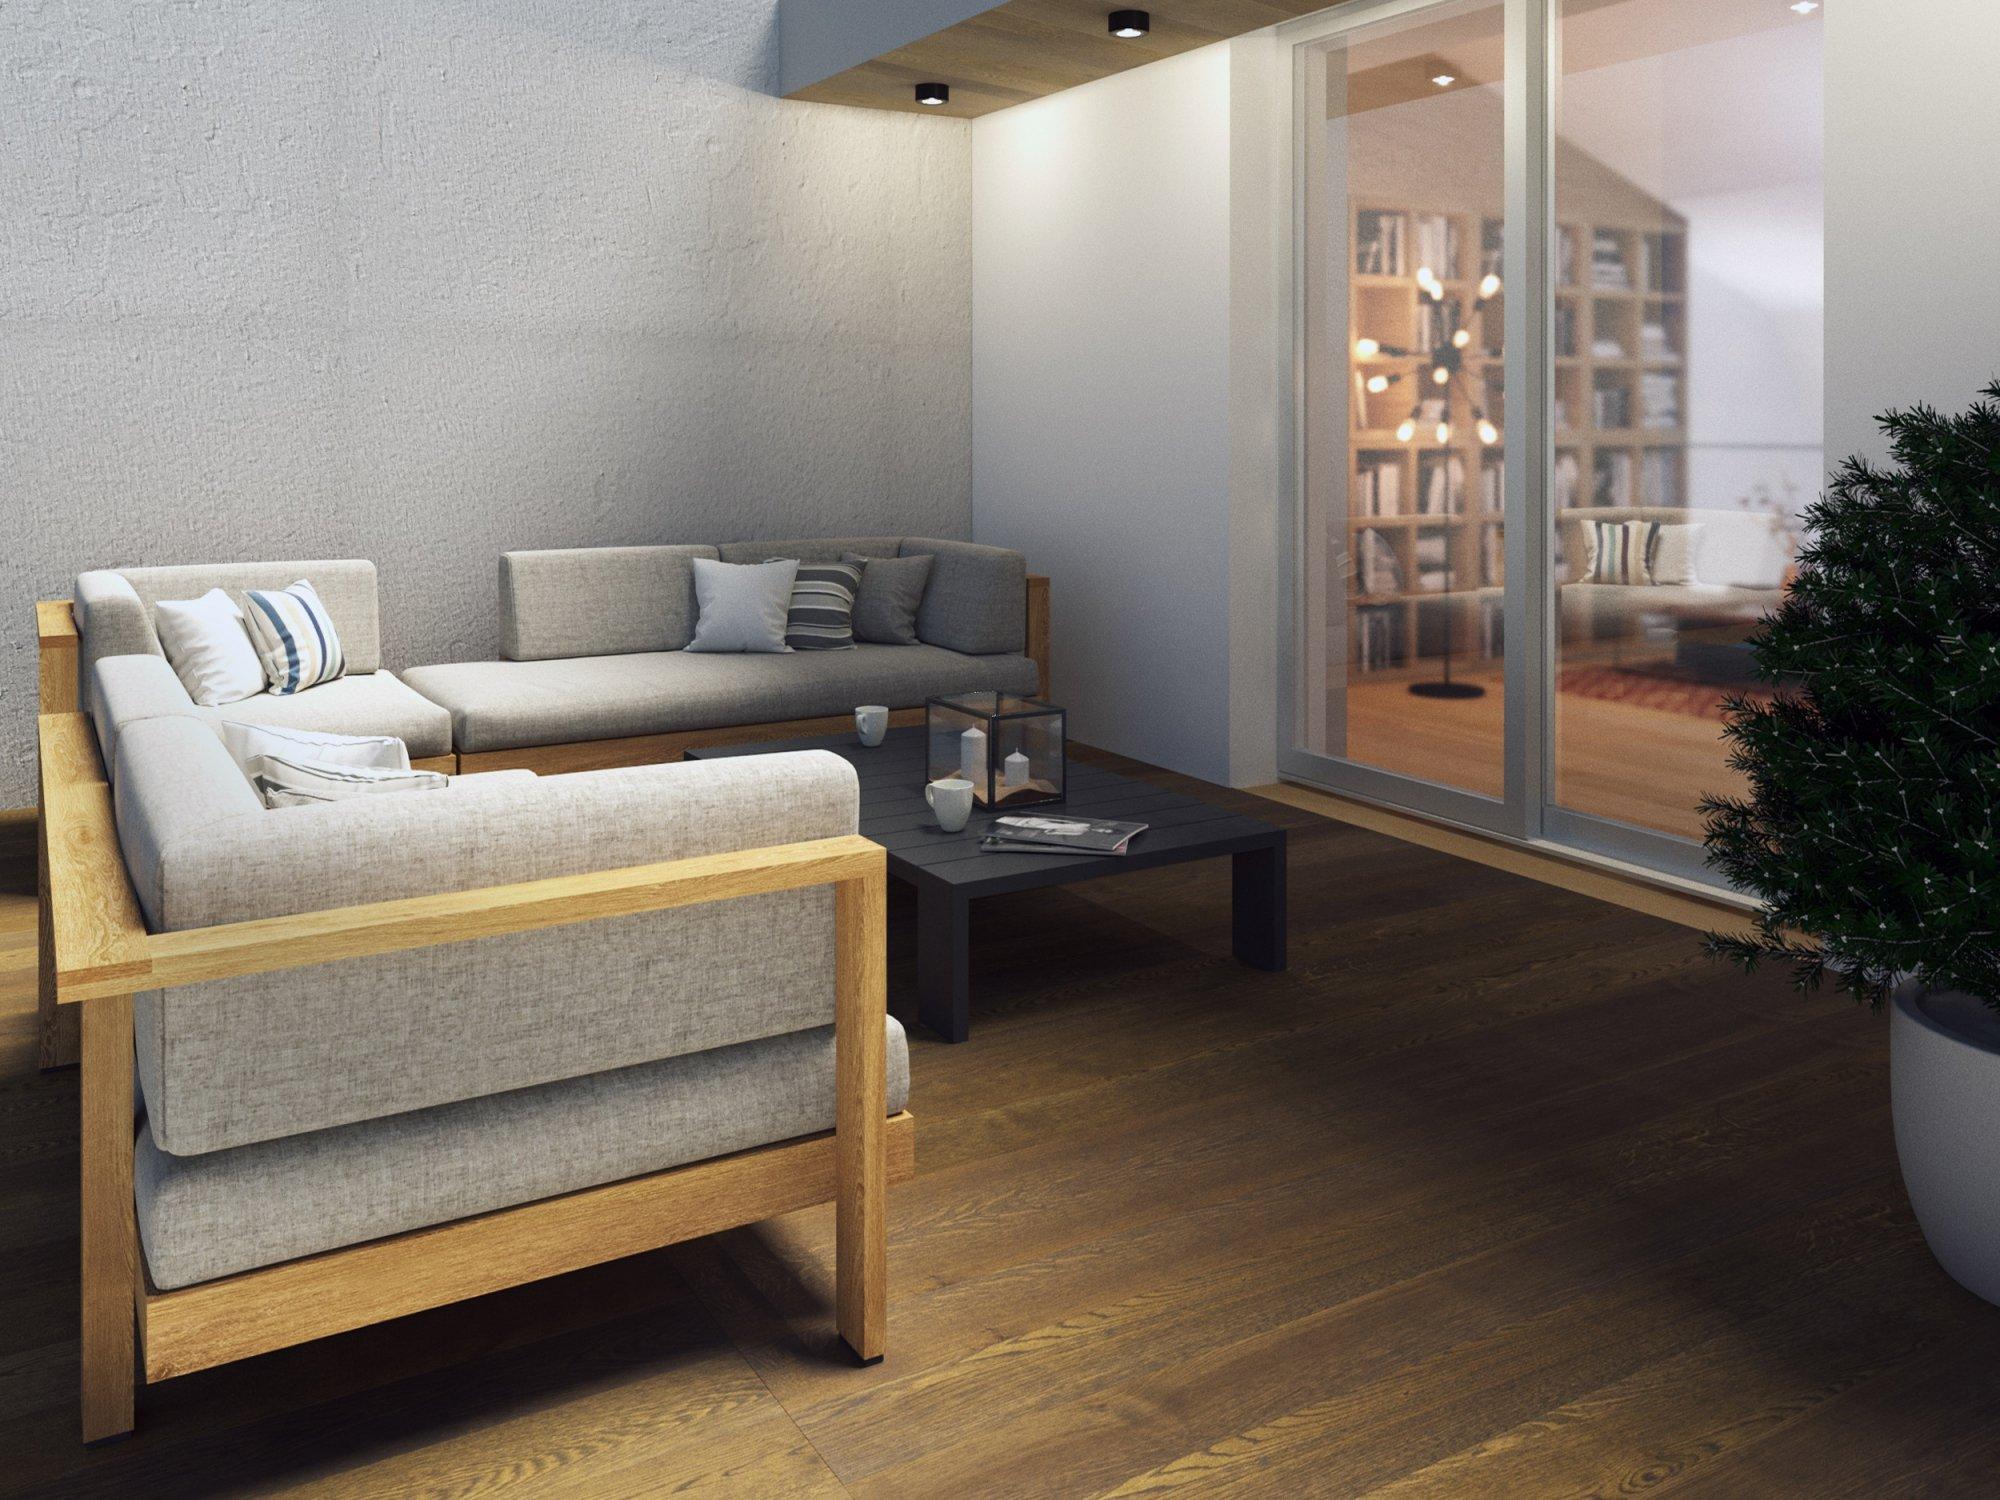 Terasa bytu č. 2 - Půdní byt 2+kk, plocha 69 m², ulice Seifertova, Praha 3 - Žižkov | 1